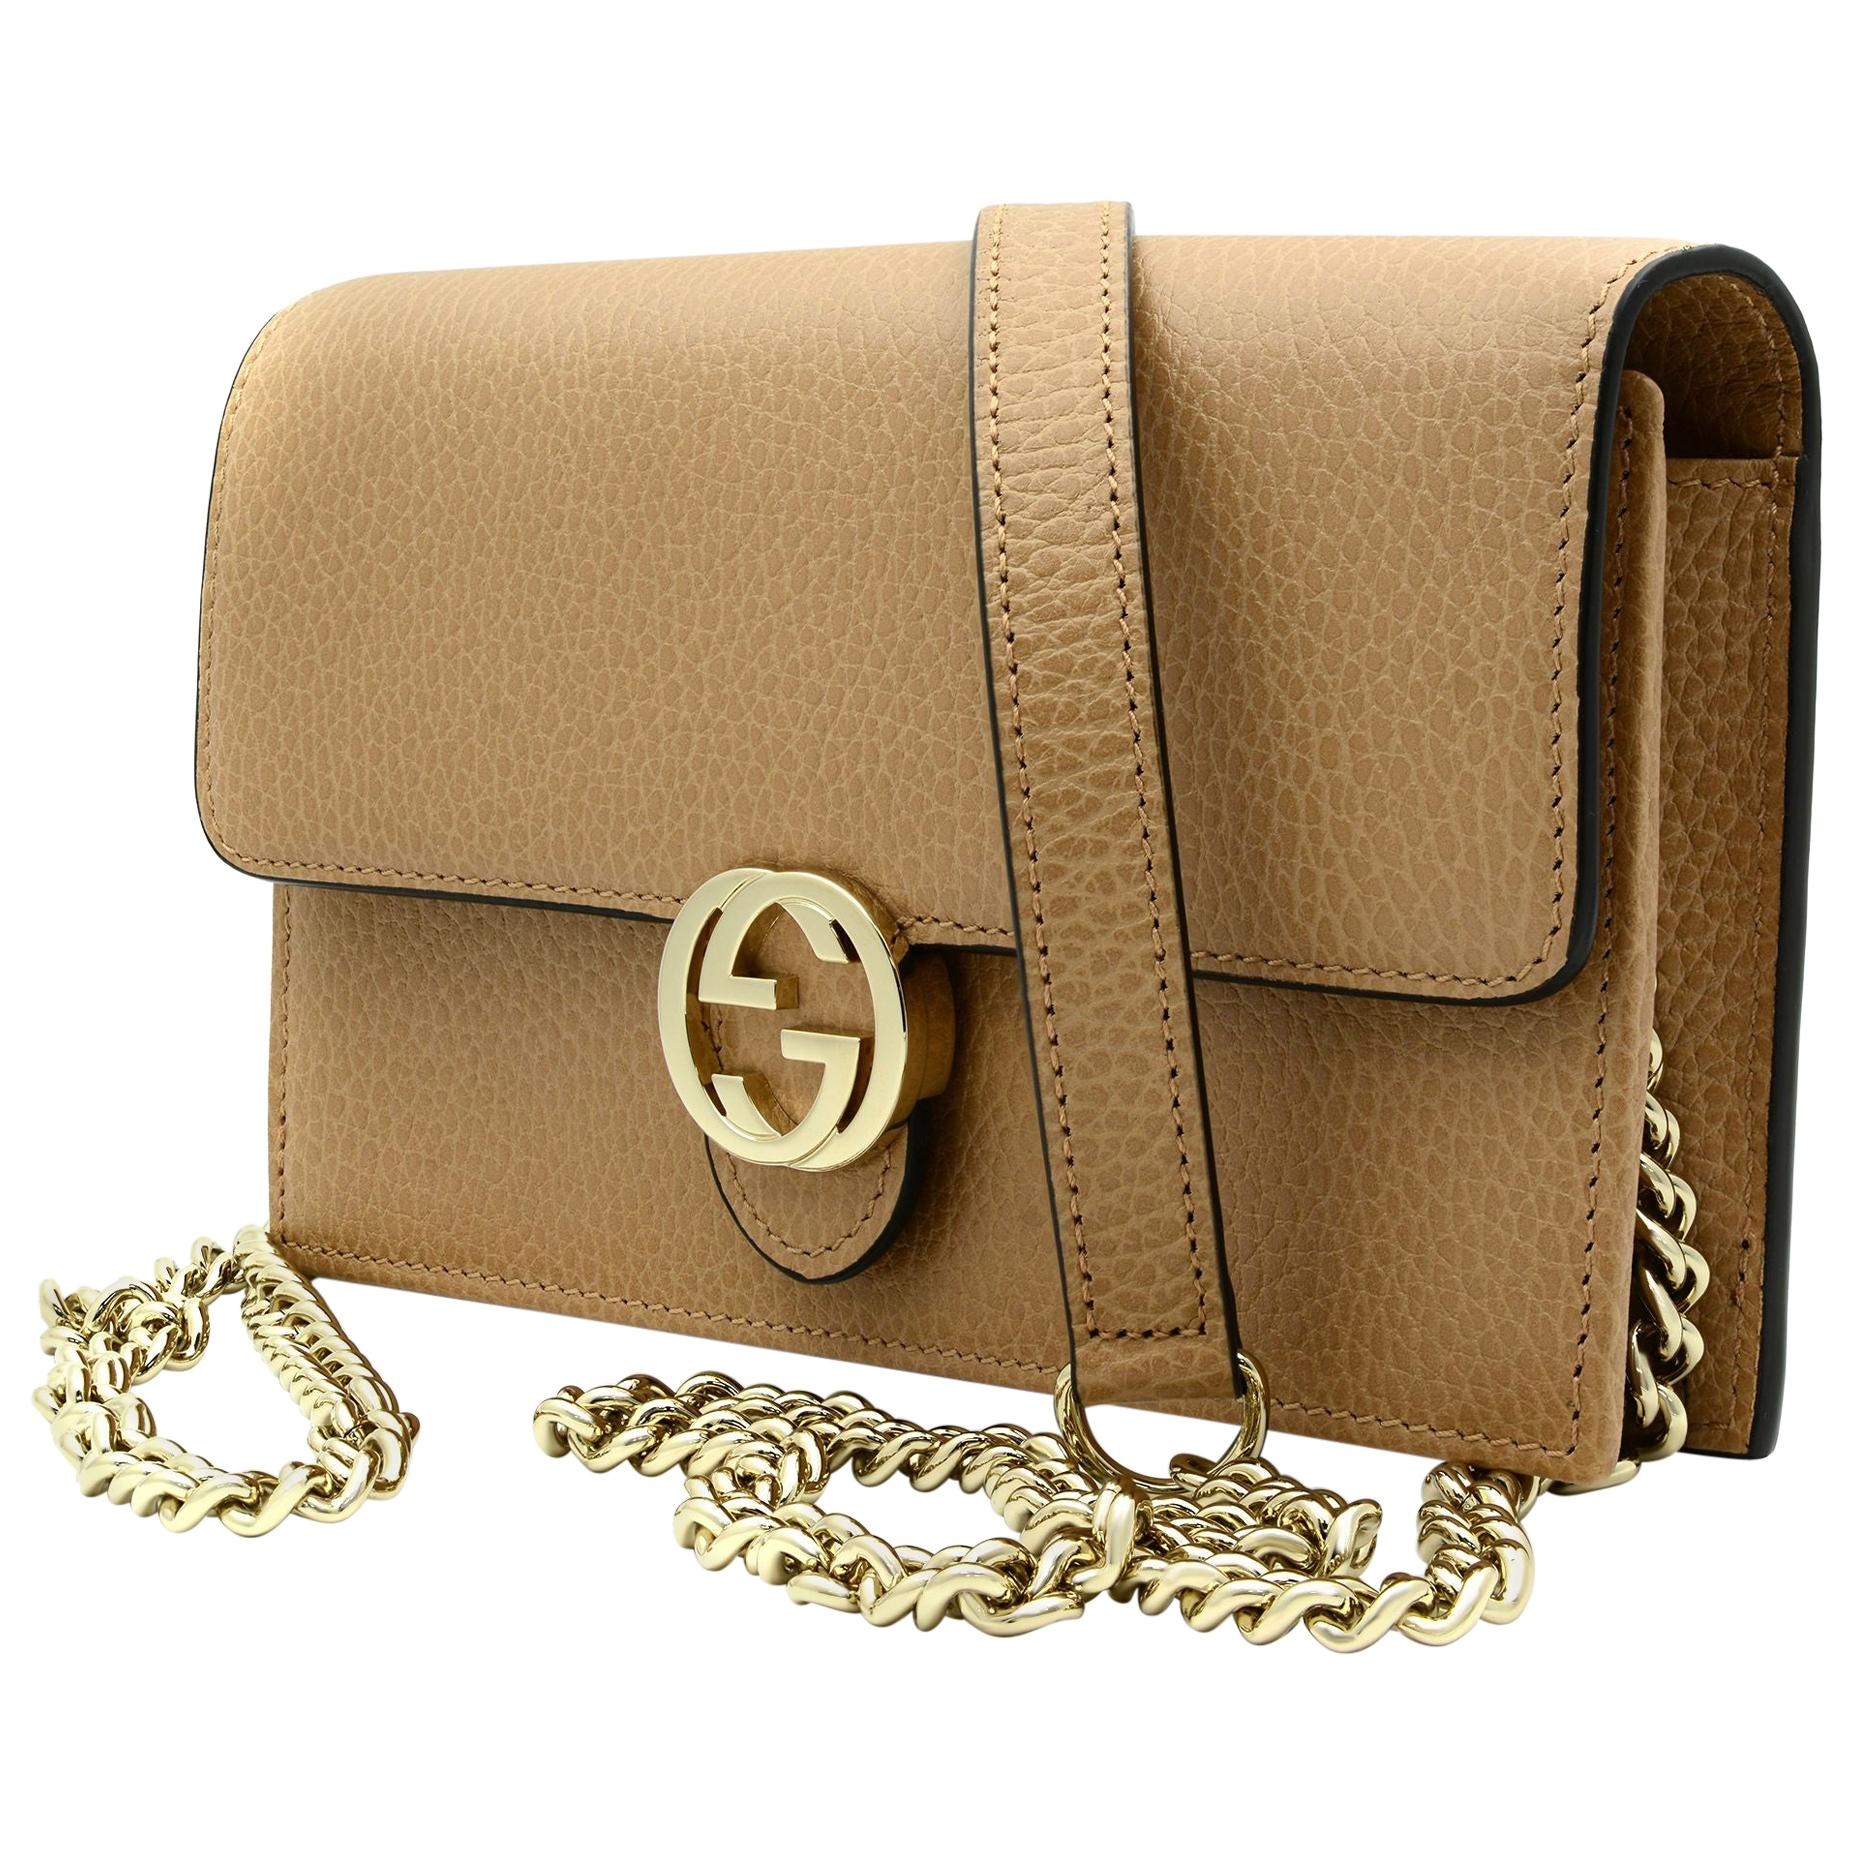 Gucci Interlocking GG Beige Leather Women's Crossbody Chain Wallet